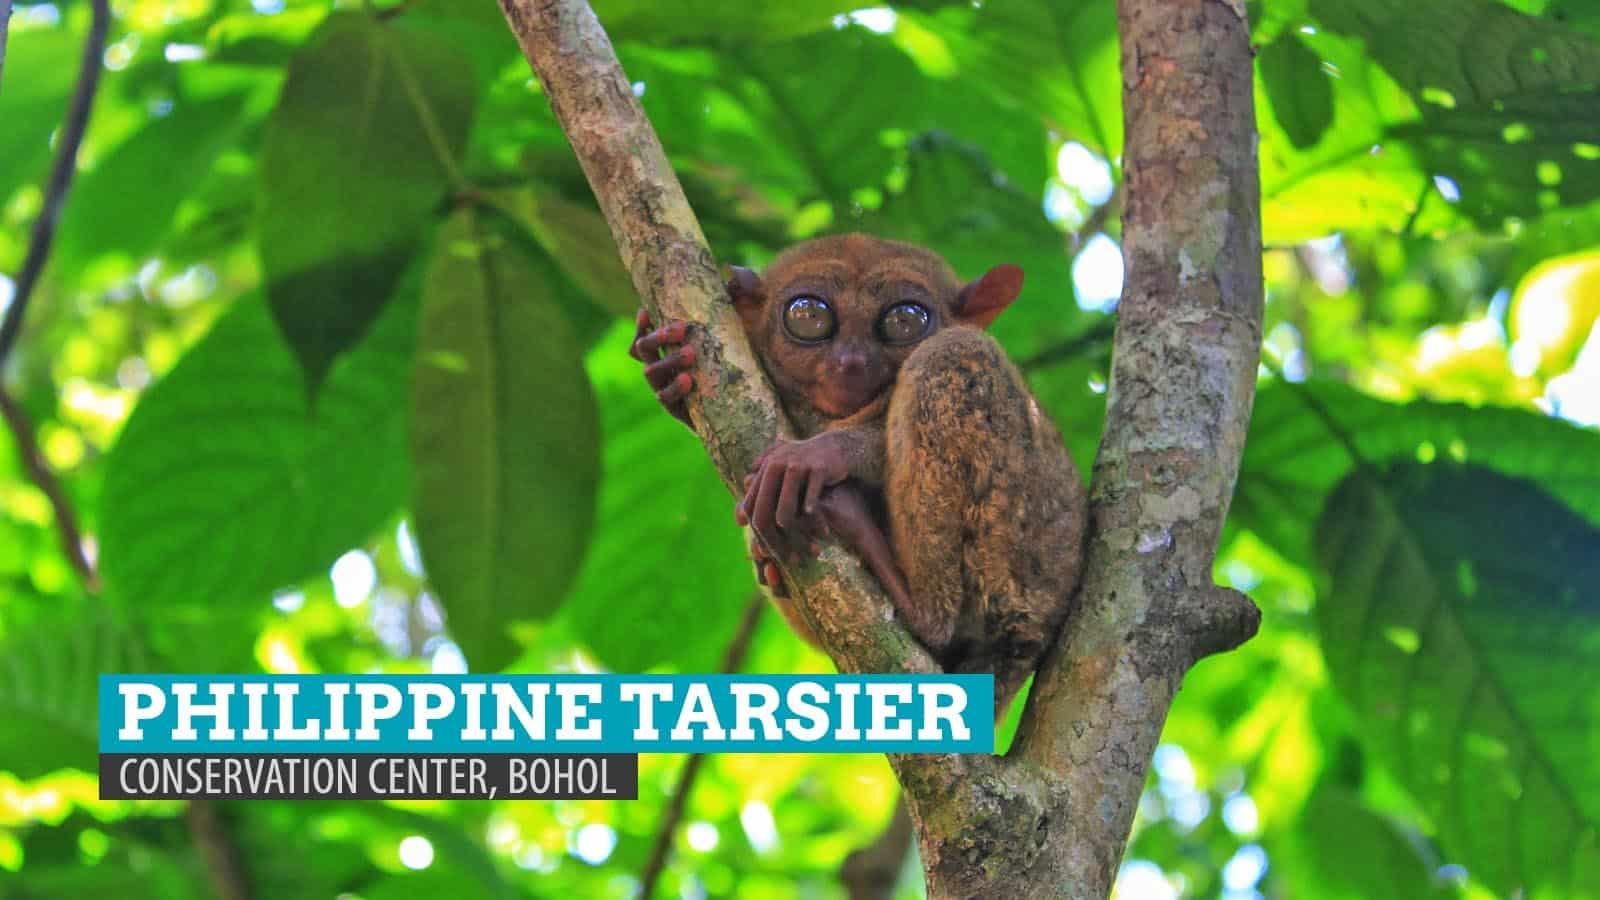 Philippine Tarsier Conservation Area in Loboc, Bohol